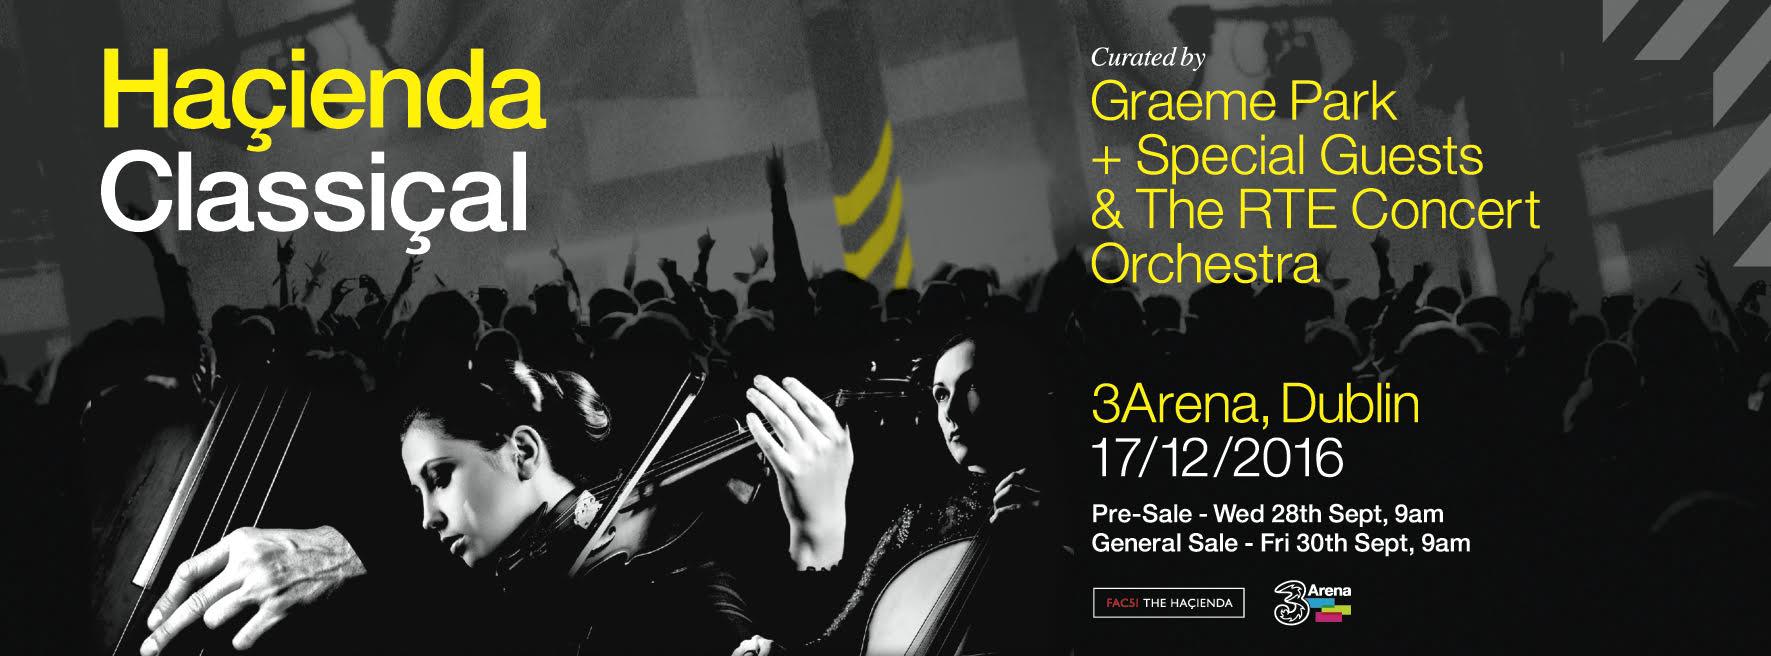 Haçienda Classical set for Dublin's 3Arena with Peter Hook, Rowetta & more